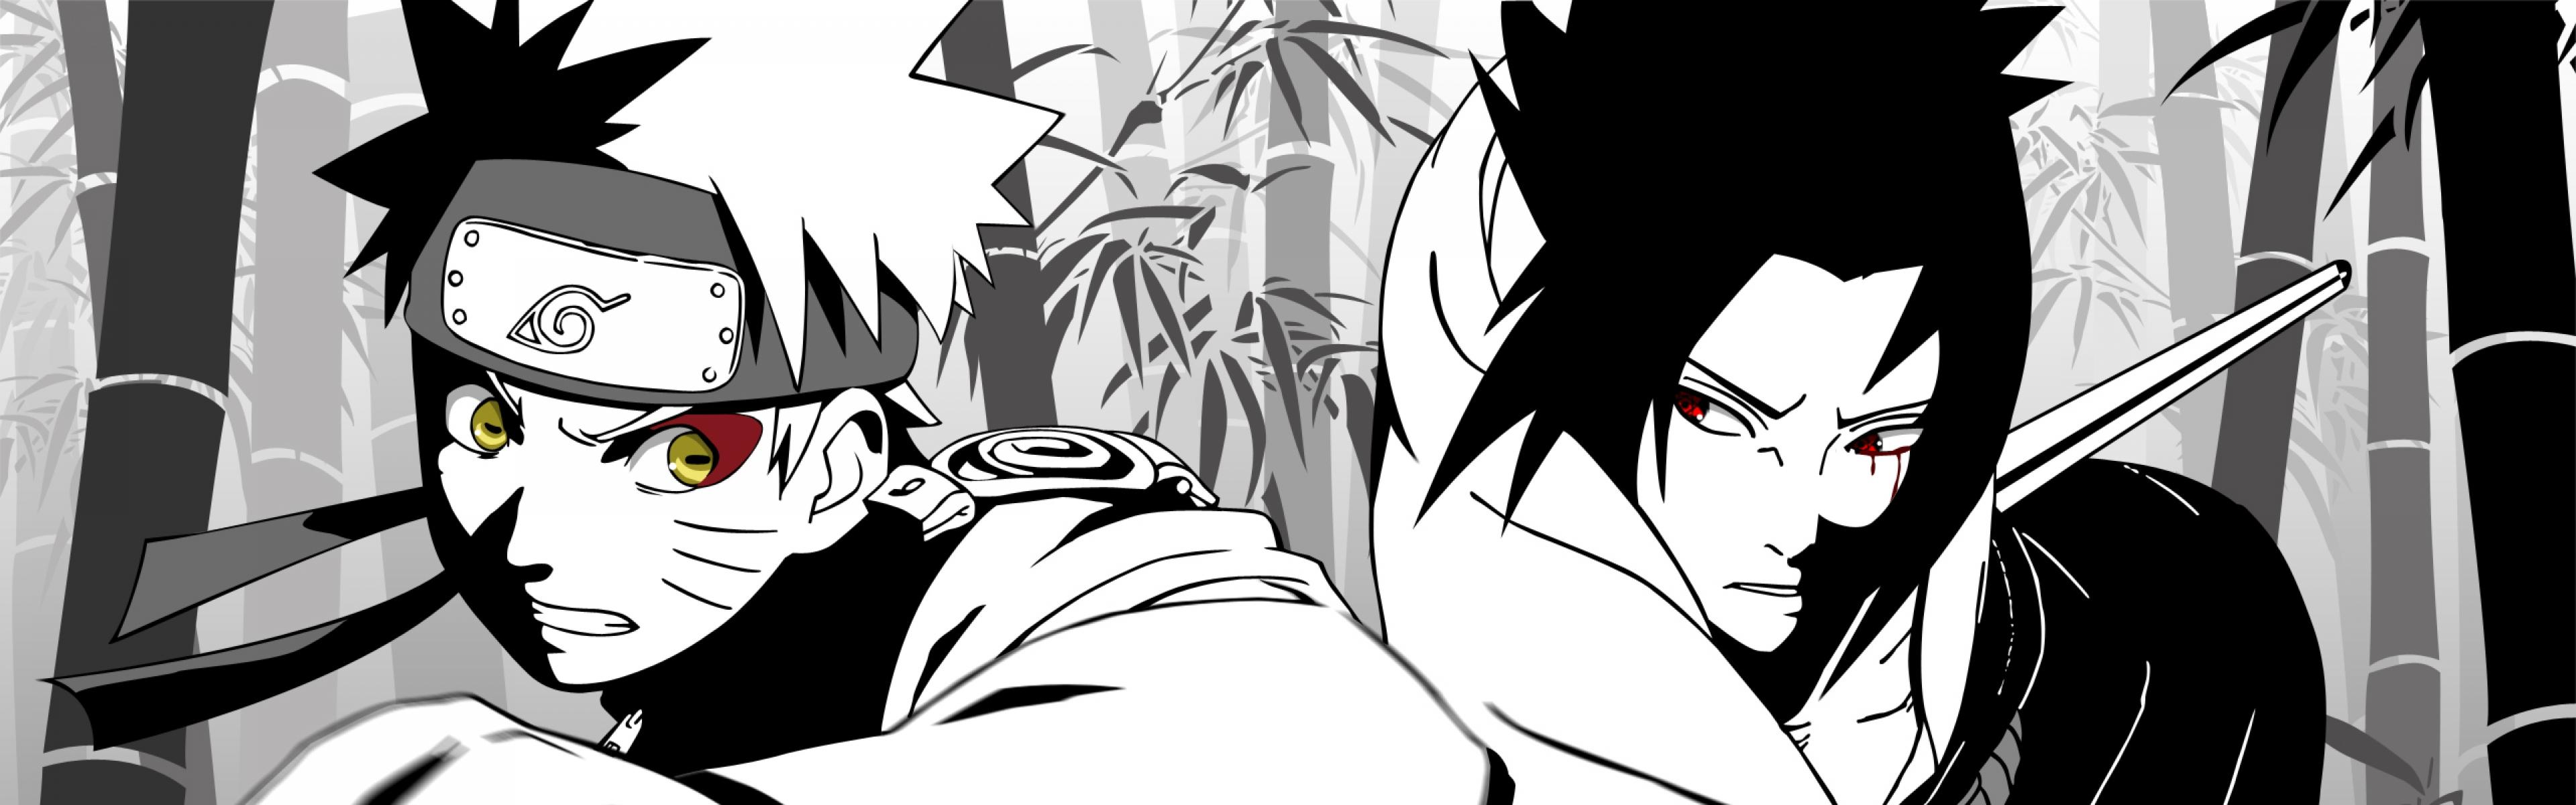 Naruto And Sasuke Dual Monitor Wallpaper